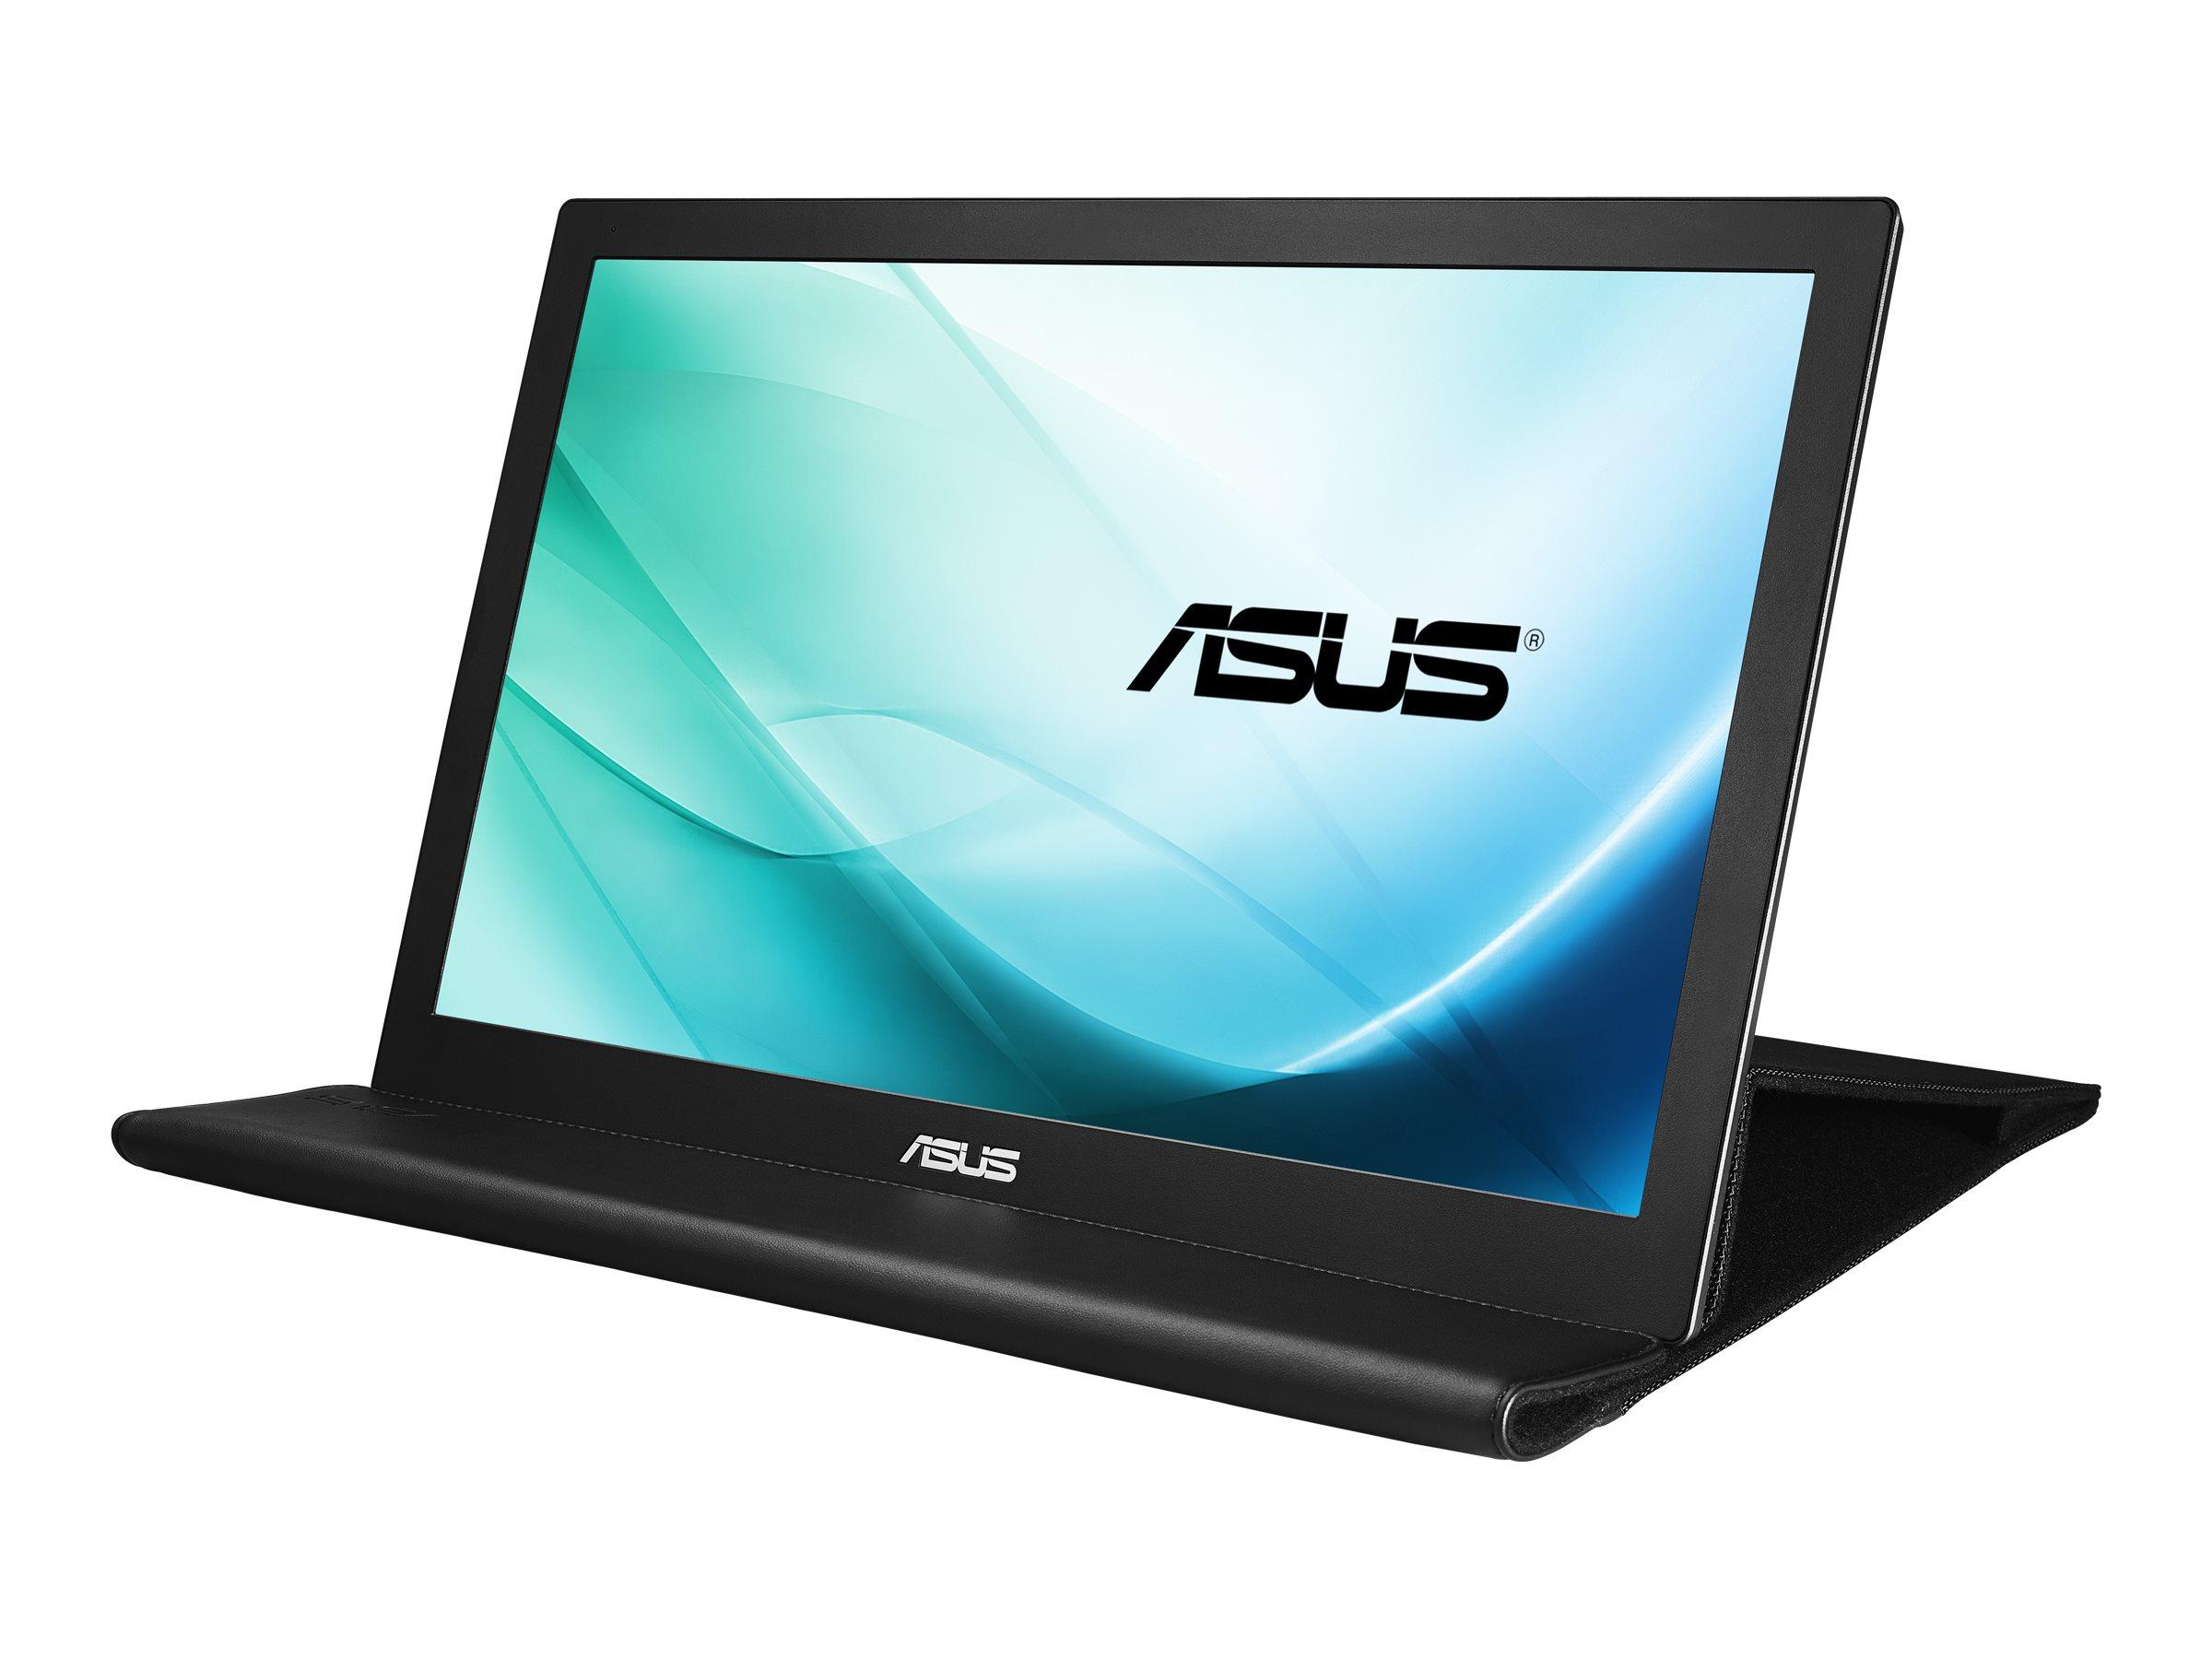 "ASUS MB169B+ - LED-Monitor - 39.6 cm (15.6"") - tragbar - 1920 x 1080 Full HD (1080p)"